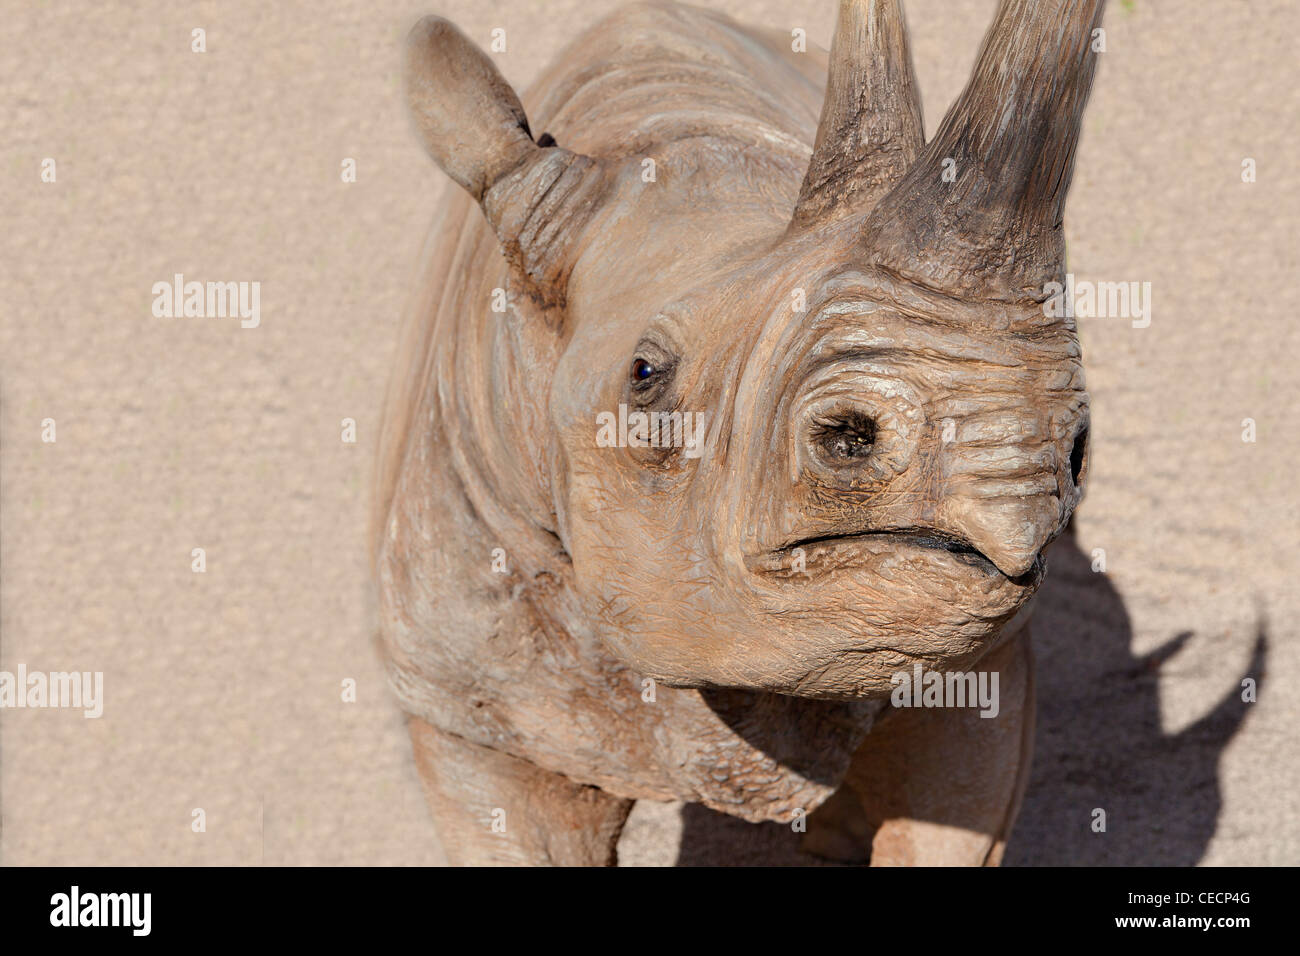 Rhinoceros close up - Stock Image